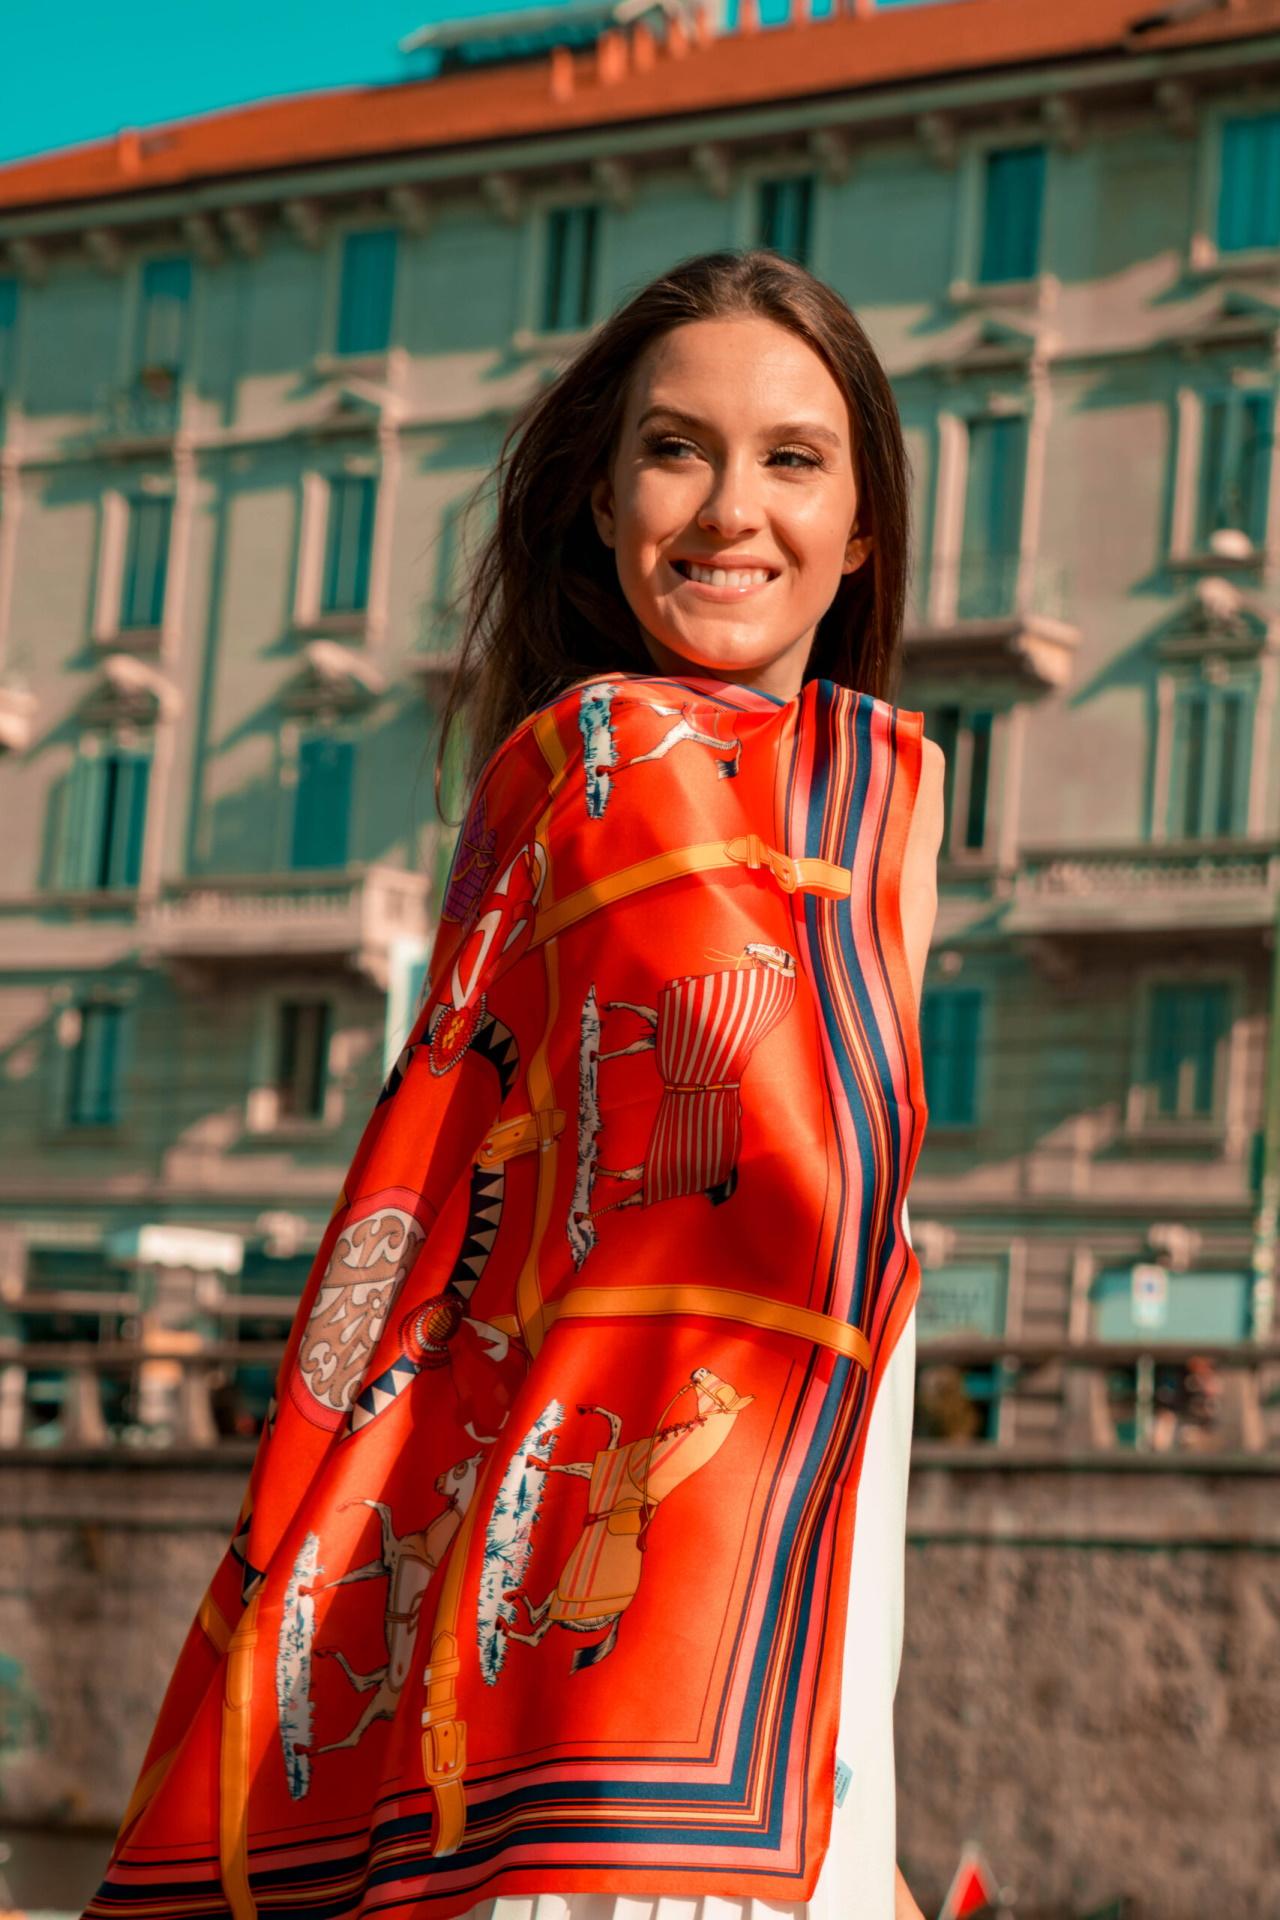 FOULARD D FOULARD SCIARPA DONNA 100 SETA 90CMX90CM 3 1stAmerican foulard/sciarpa 100% seta da donna 90cmx90cm